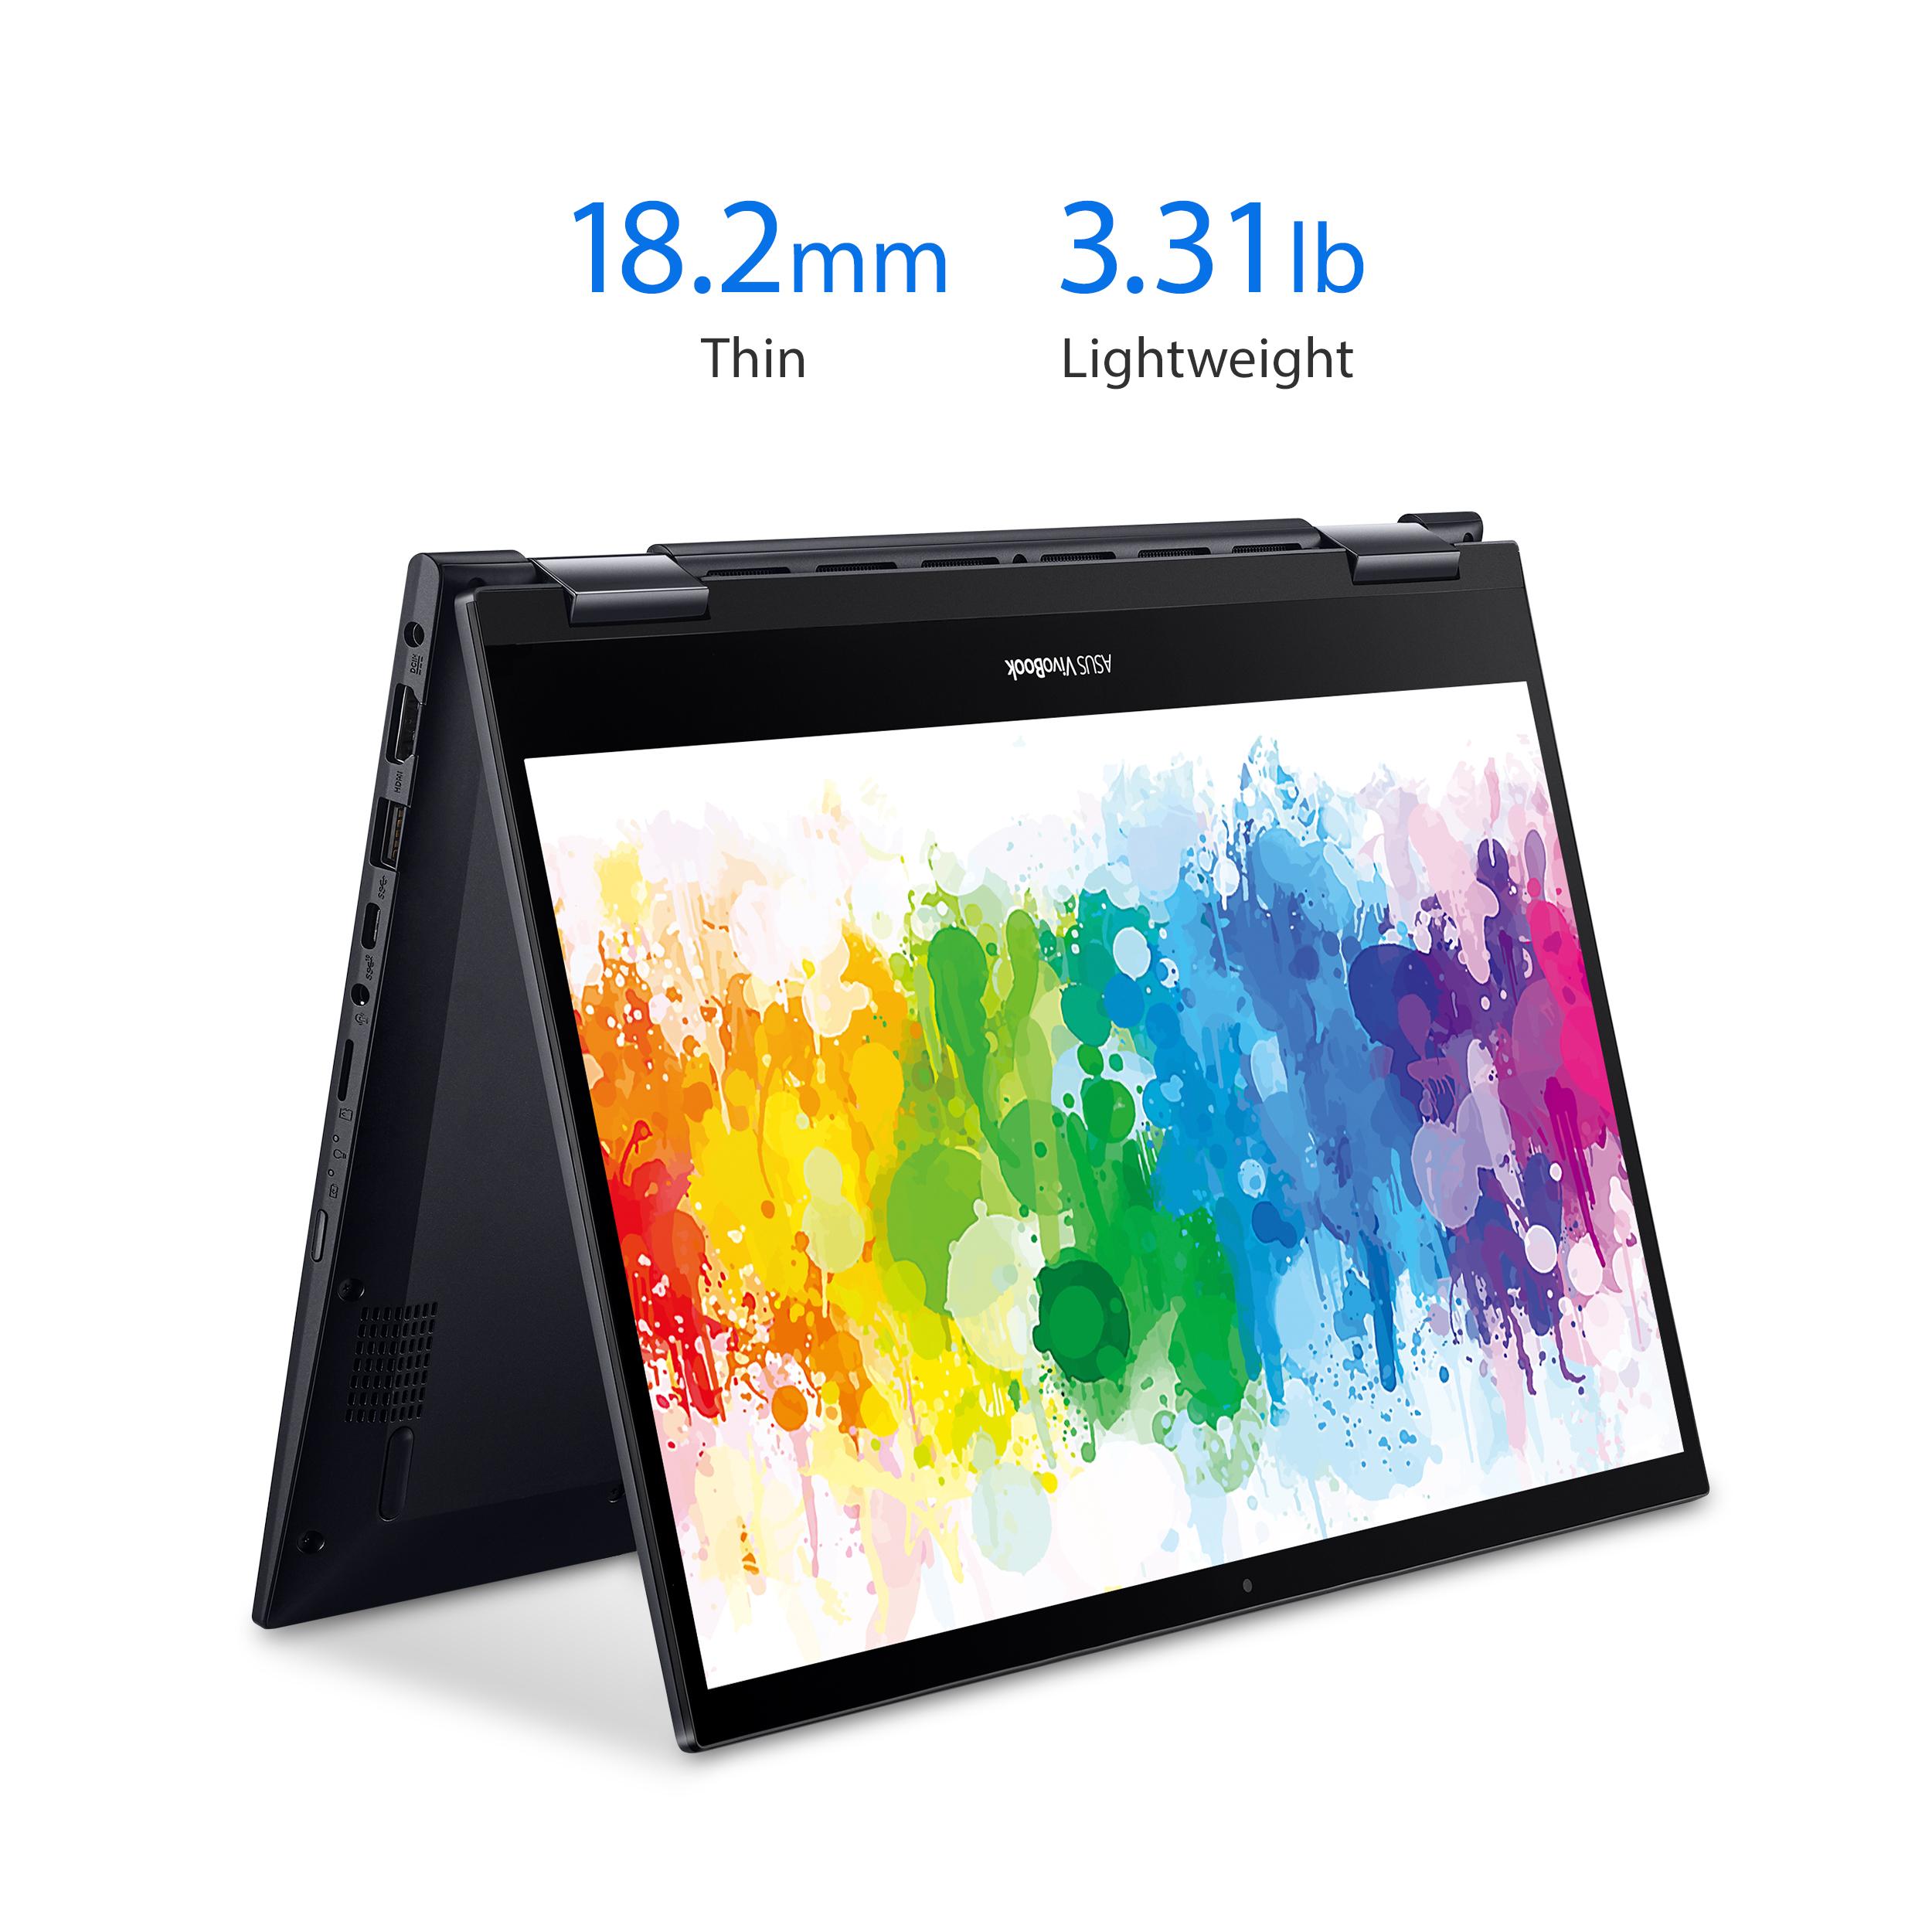 "ASUS Vivobook Flip 2-in-1 Laptop: Ryzen 5 5500U, 14"" IPS, 8GB DDR4, 256GB SSD"